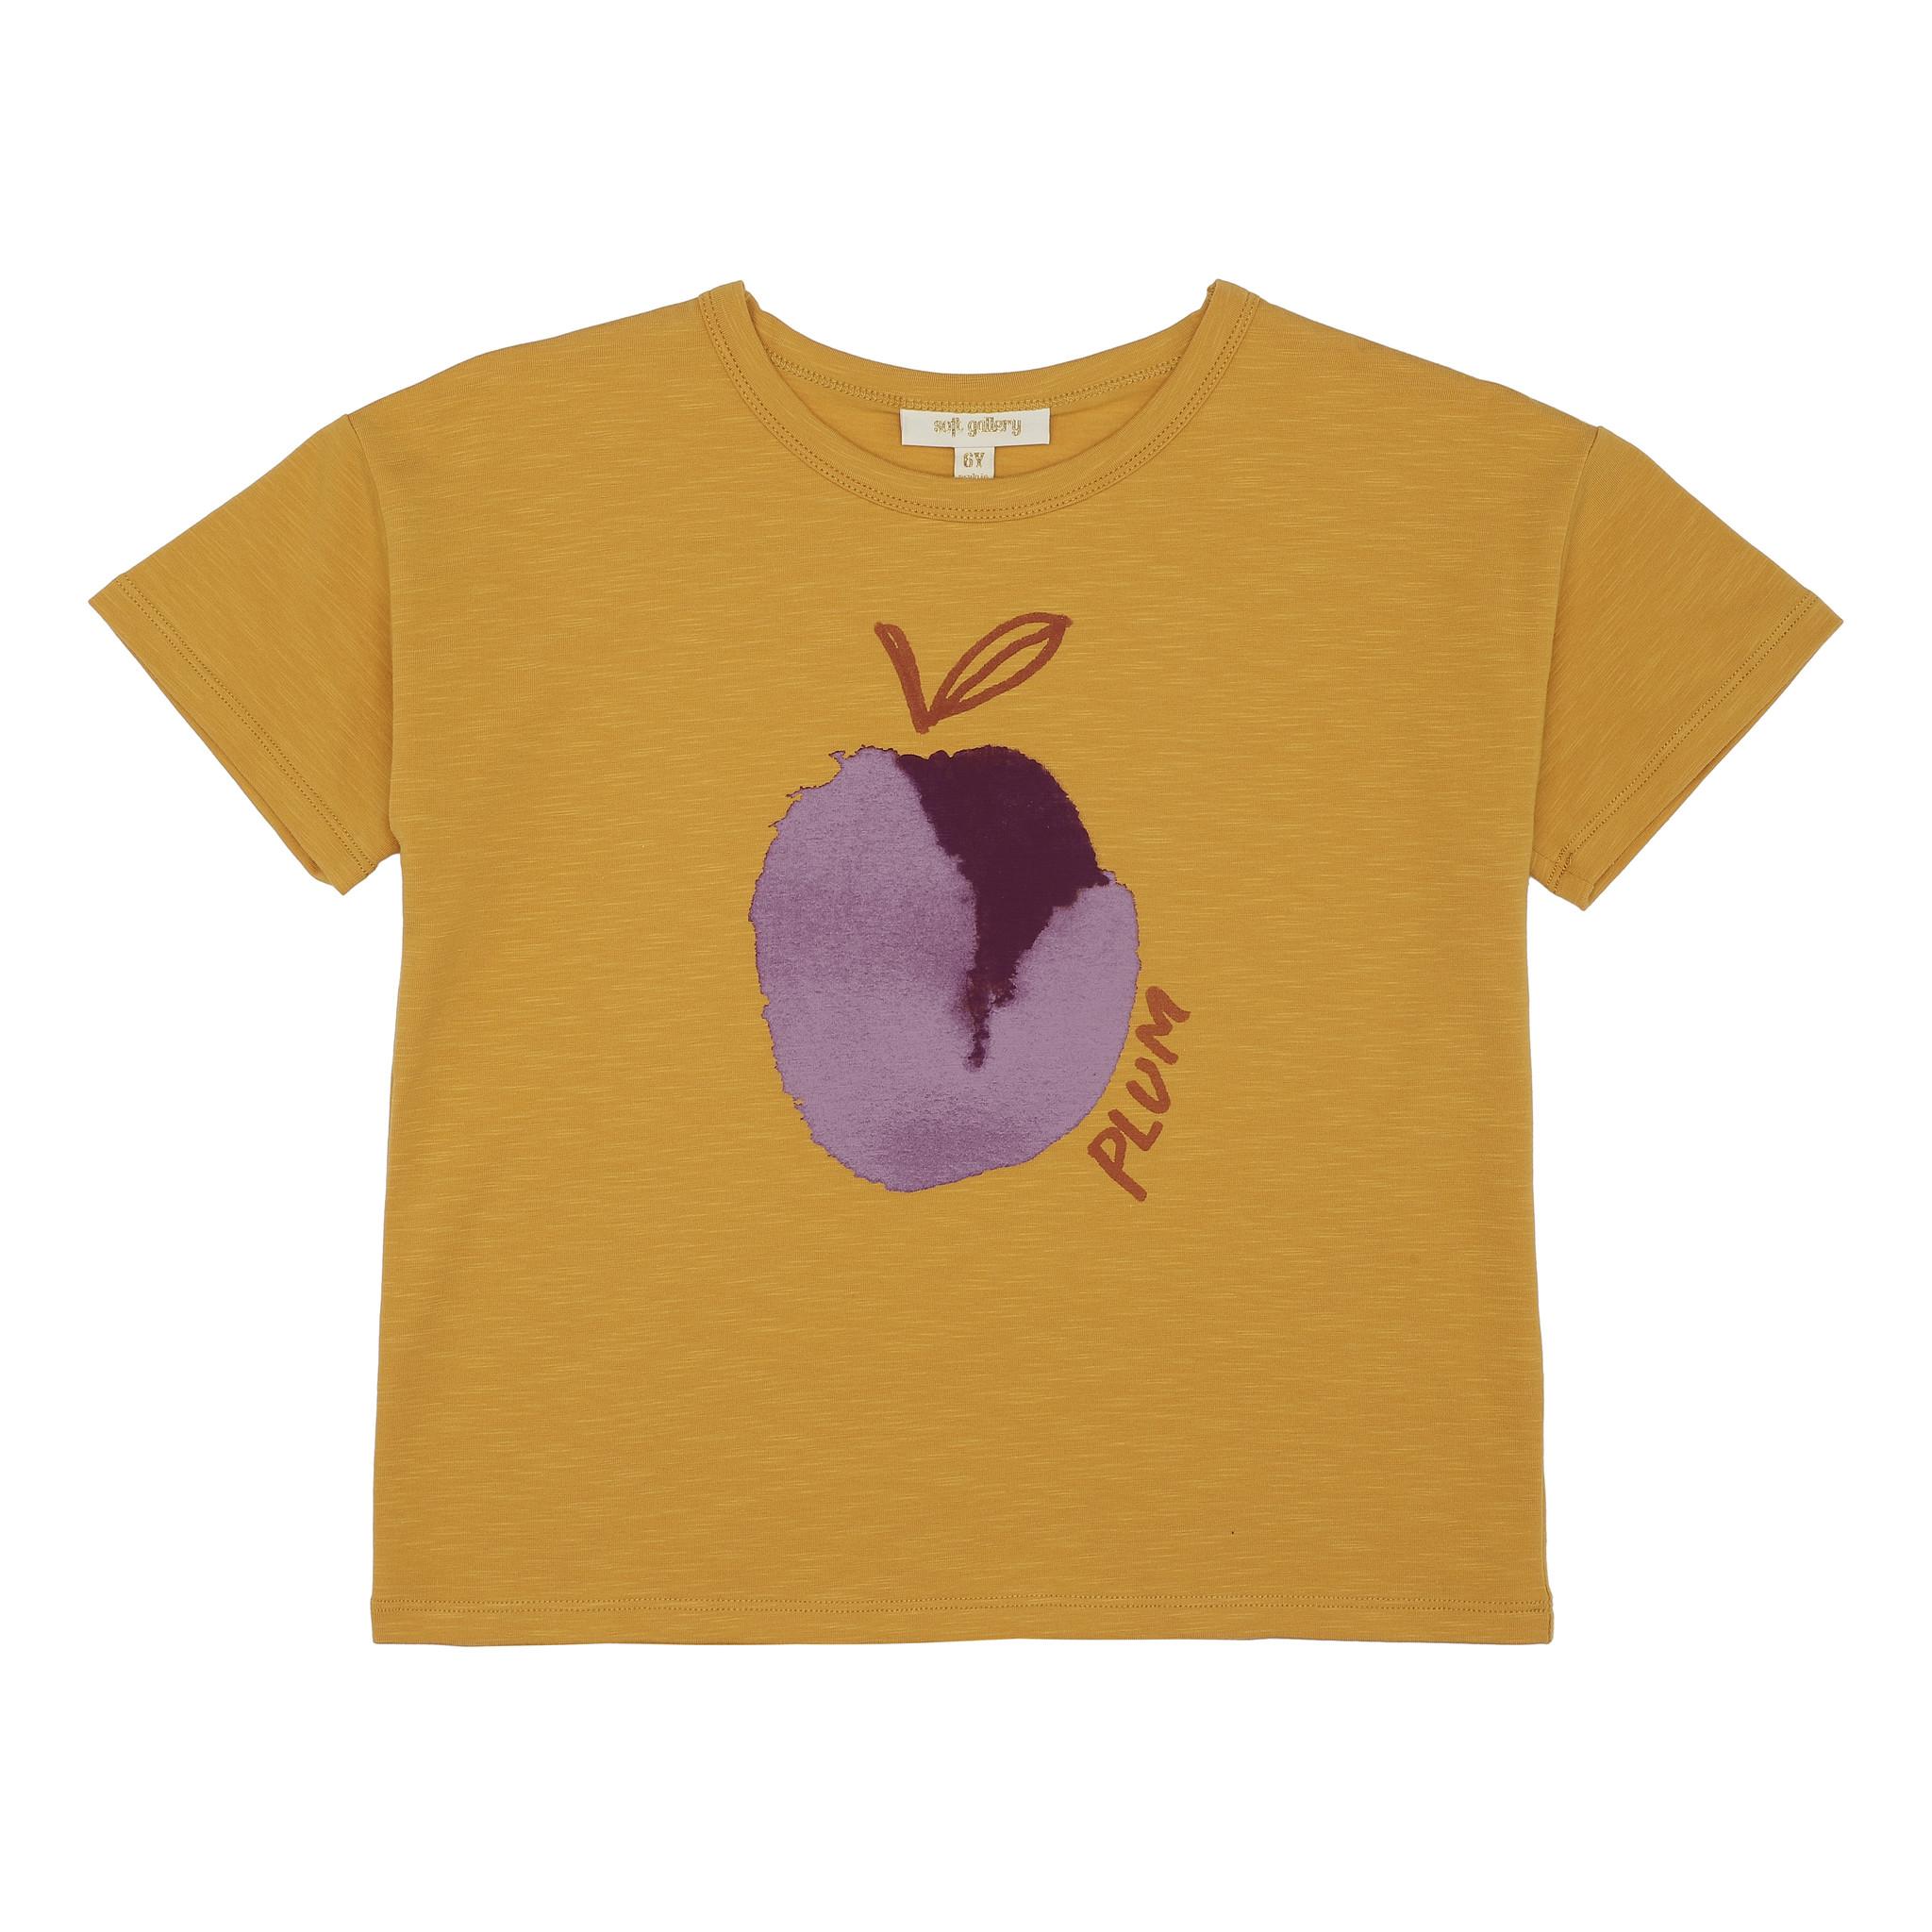 Dharma T-shirt - Sunflower / Plum-1